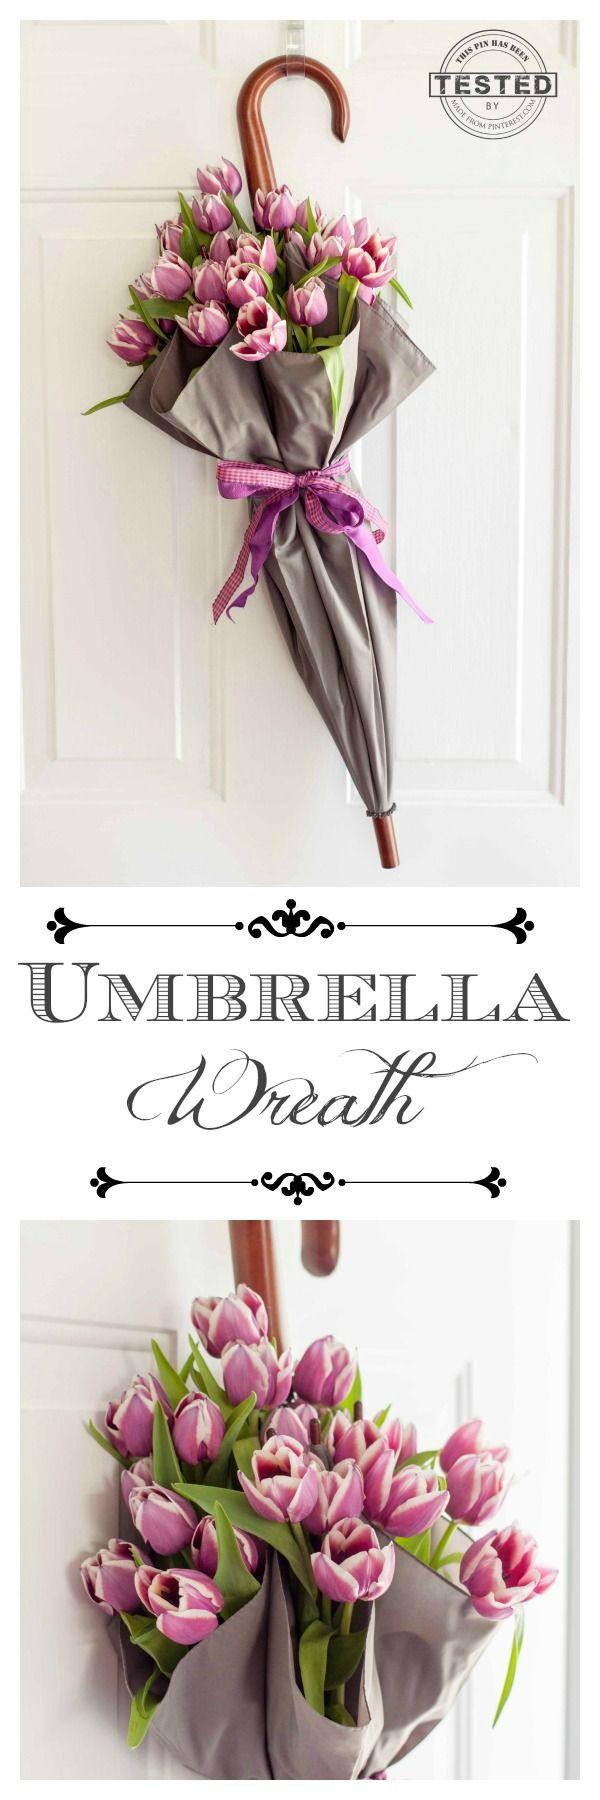 DIY Umbrella Wreath